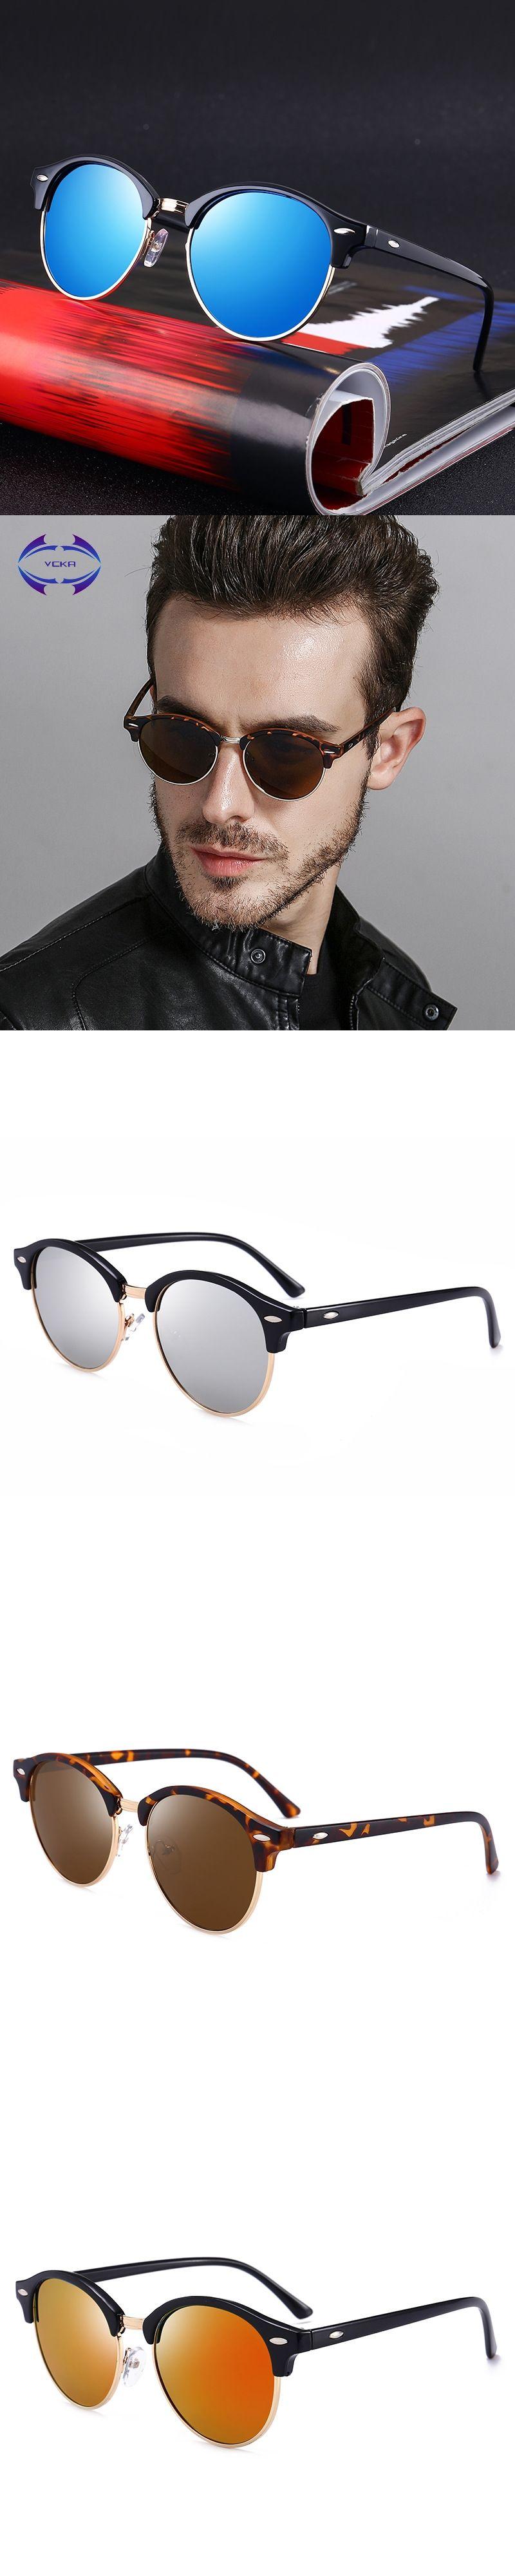 eaaa2fdb083 VCKA Round Polarized Sunglasses Women Brand Designer 2018 Luxury Vintage  Sun Glasses Men mirror UV400 Shades